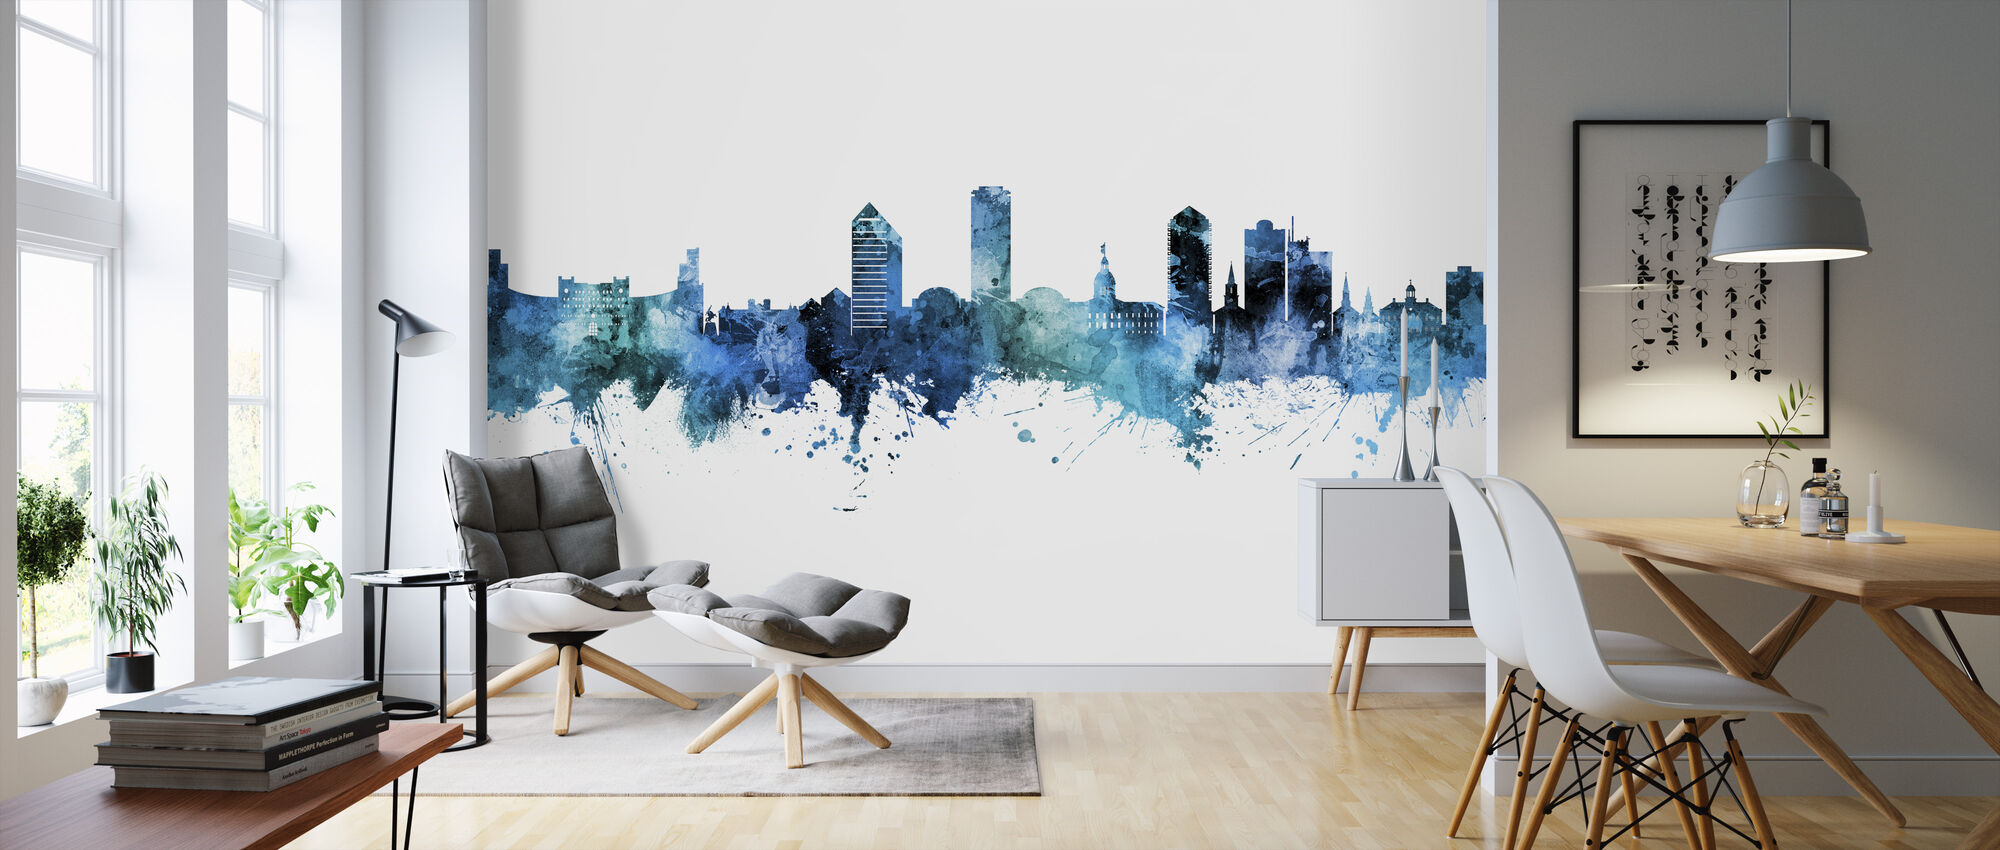 Tallahassee Florida Skyline - Wallpaper - Living Room